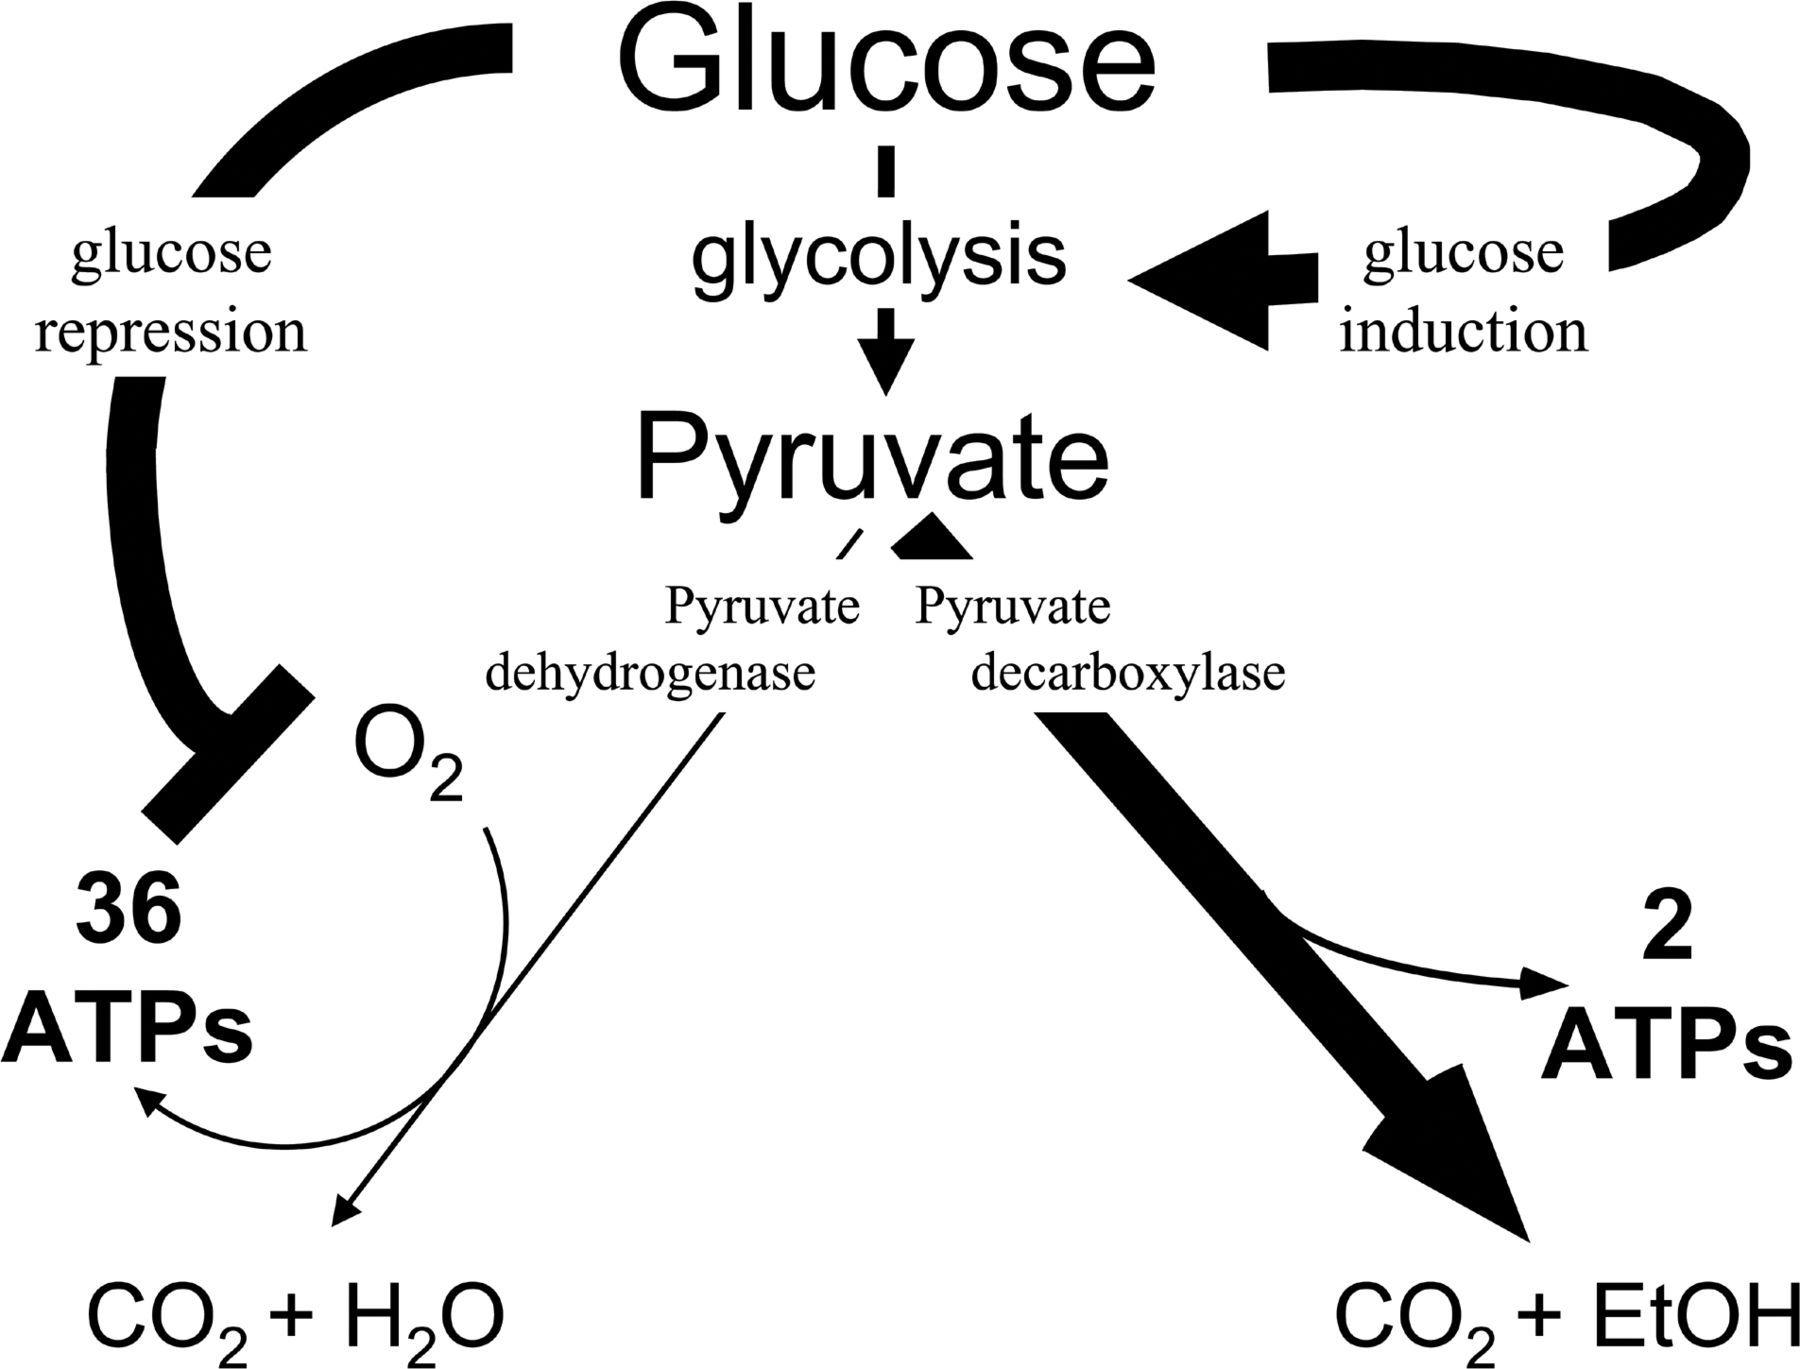 Glucose Metabolism Diagram Glucose As A Hormone Receptor Mediated Glucose Sensing In Telecharger Gratuit